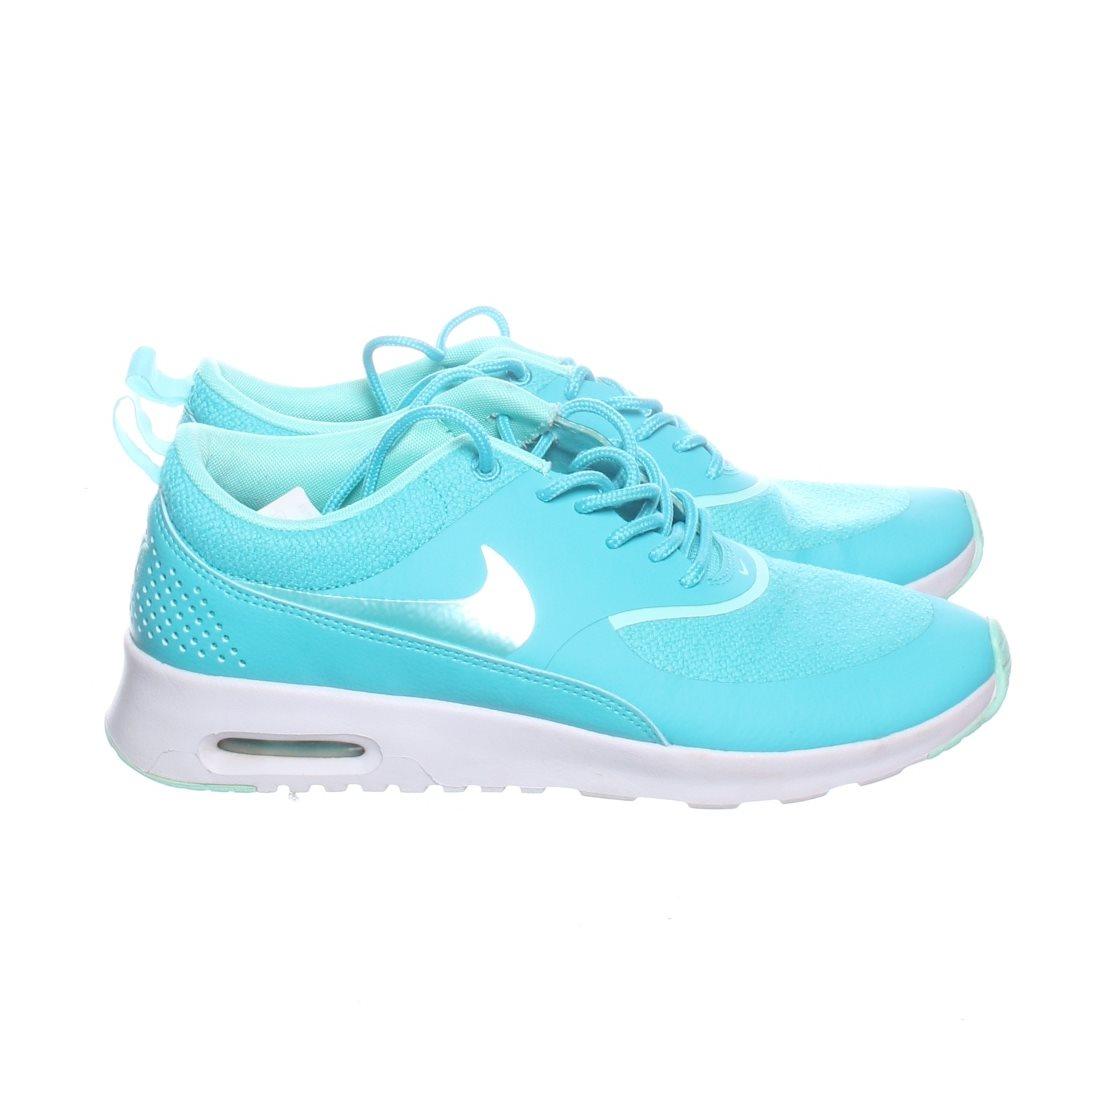 buy online ad75c 57e7b Nike, Sneakers, Strl  40, Air max thea, Blå Vit